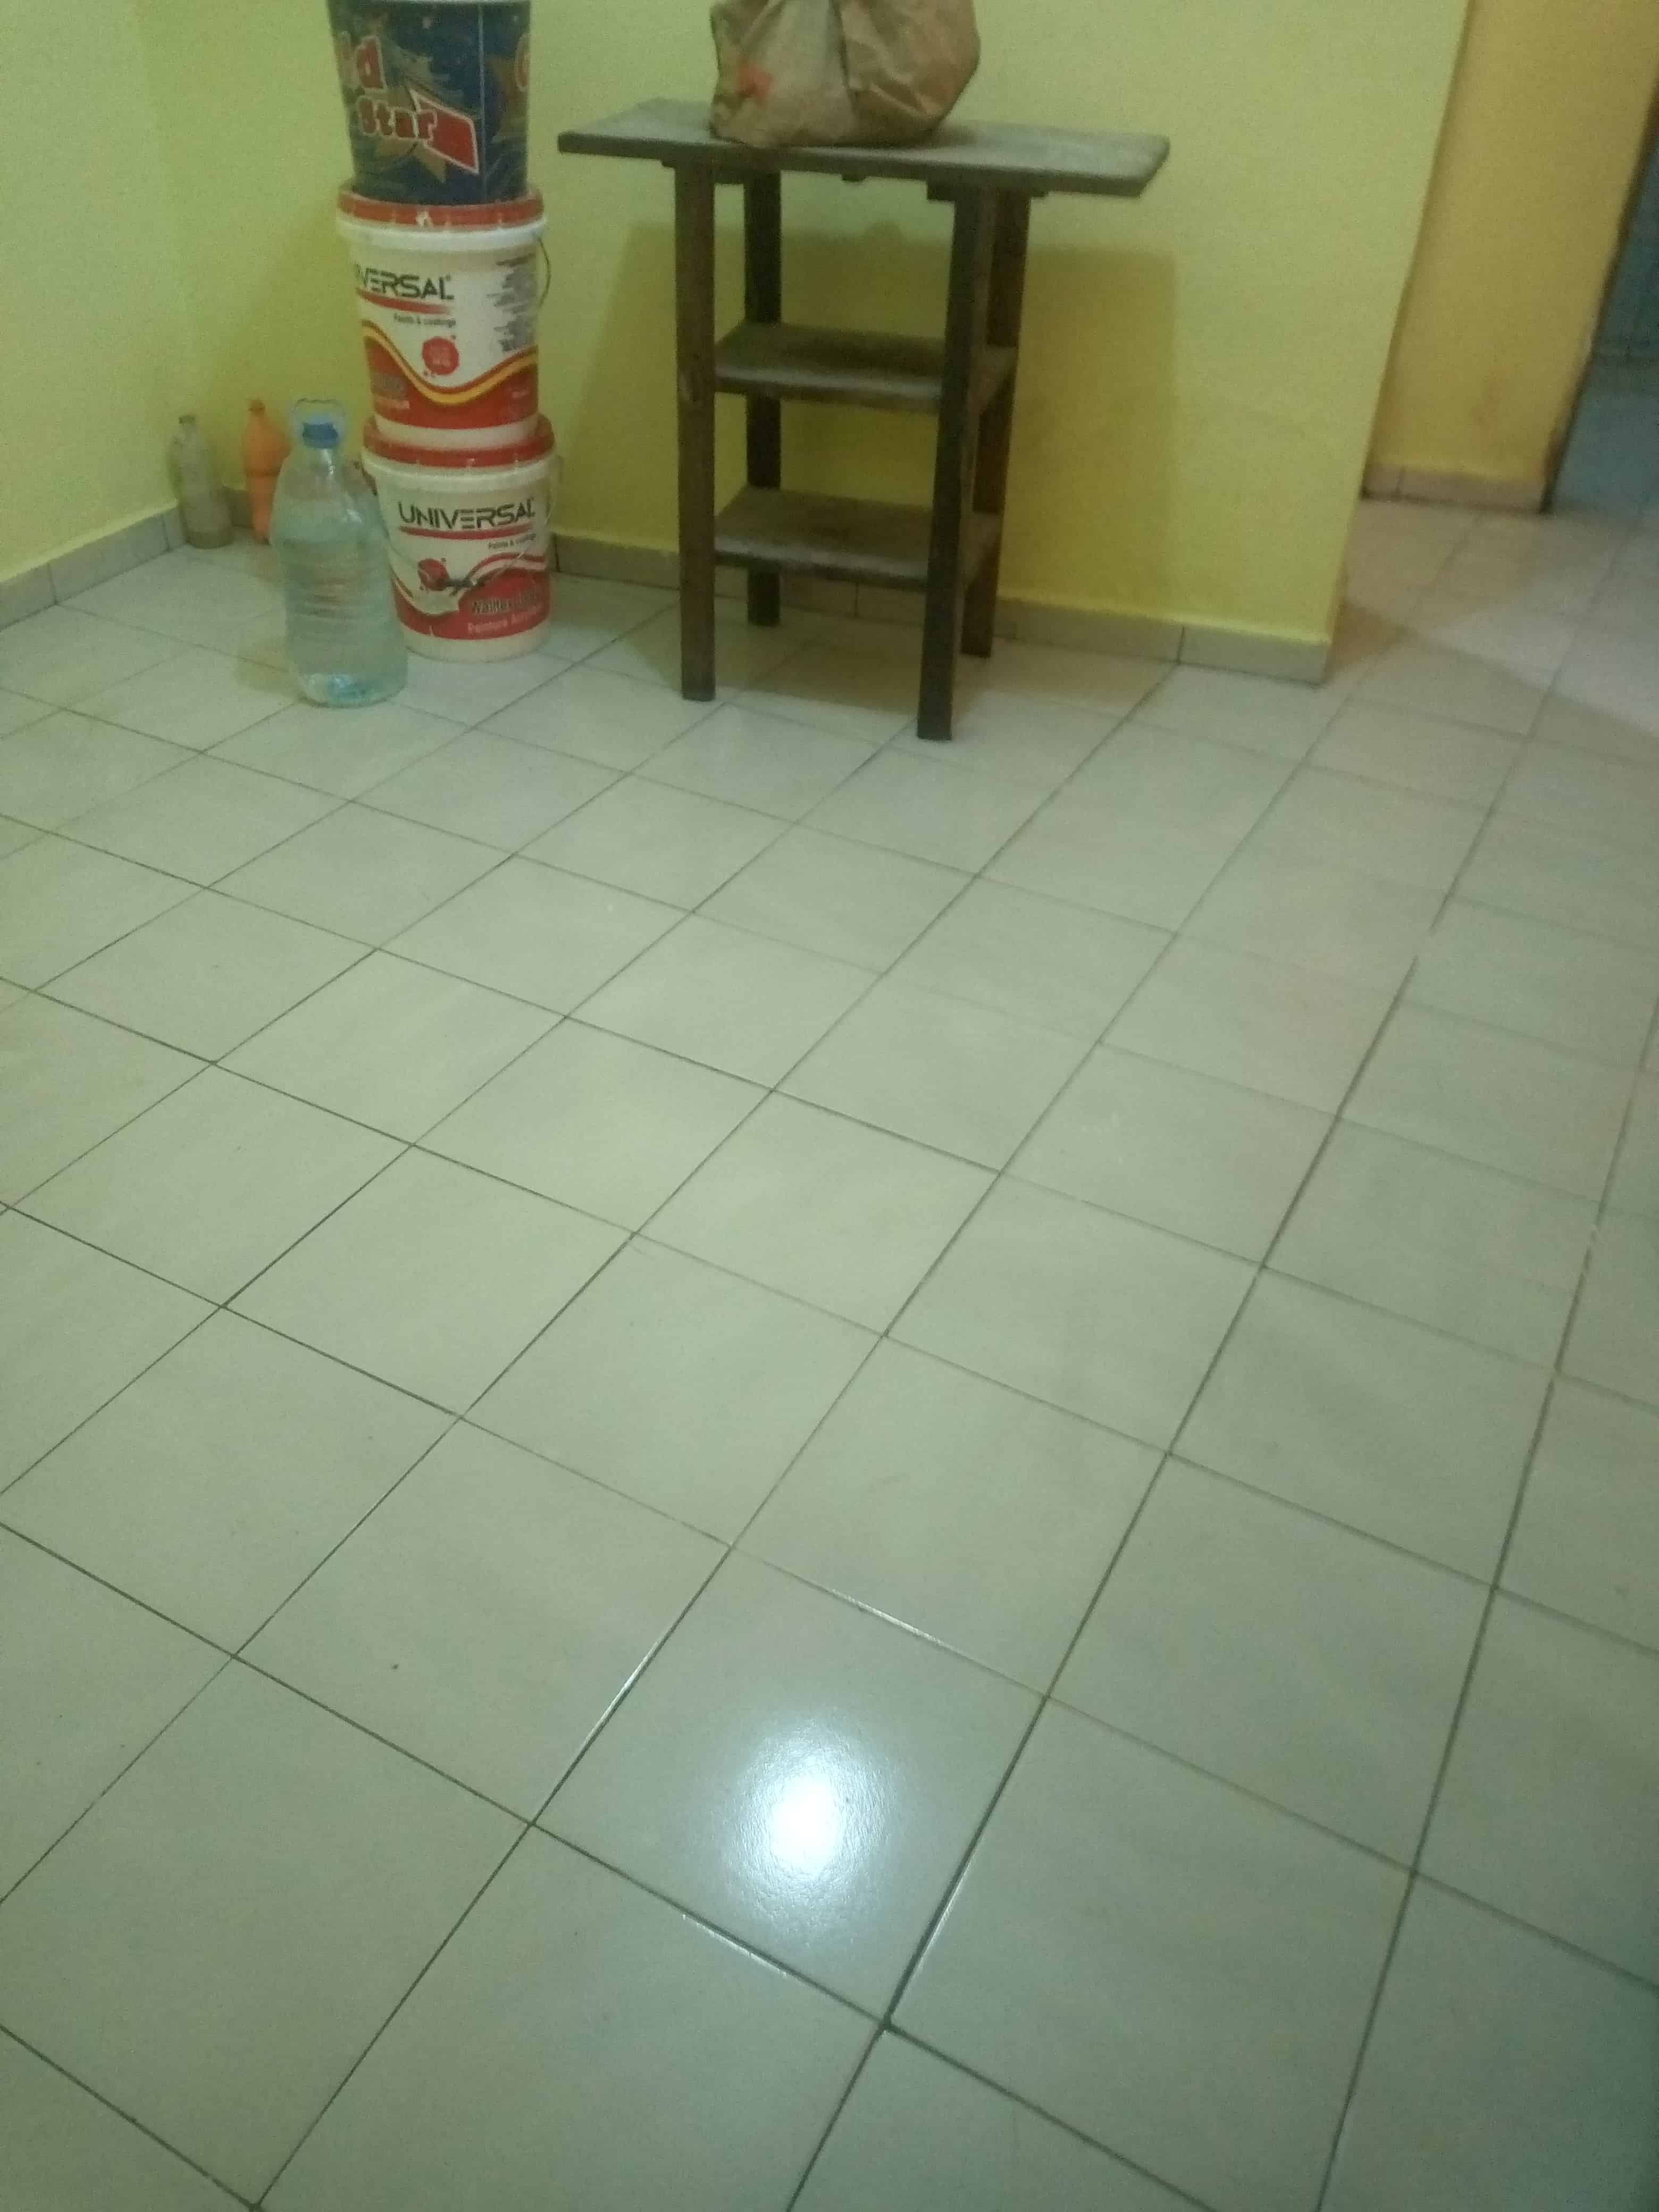 Studio to rent - Douala, Makepe, Boscom missoke - 25 000 FCFA / month